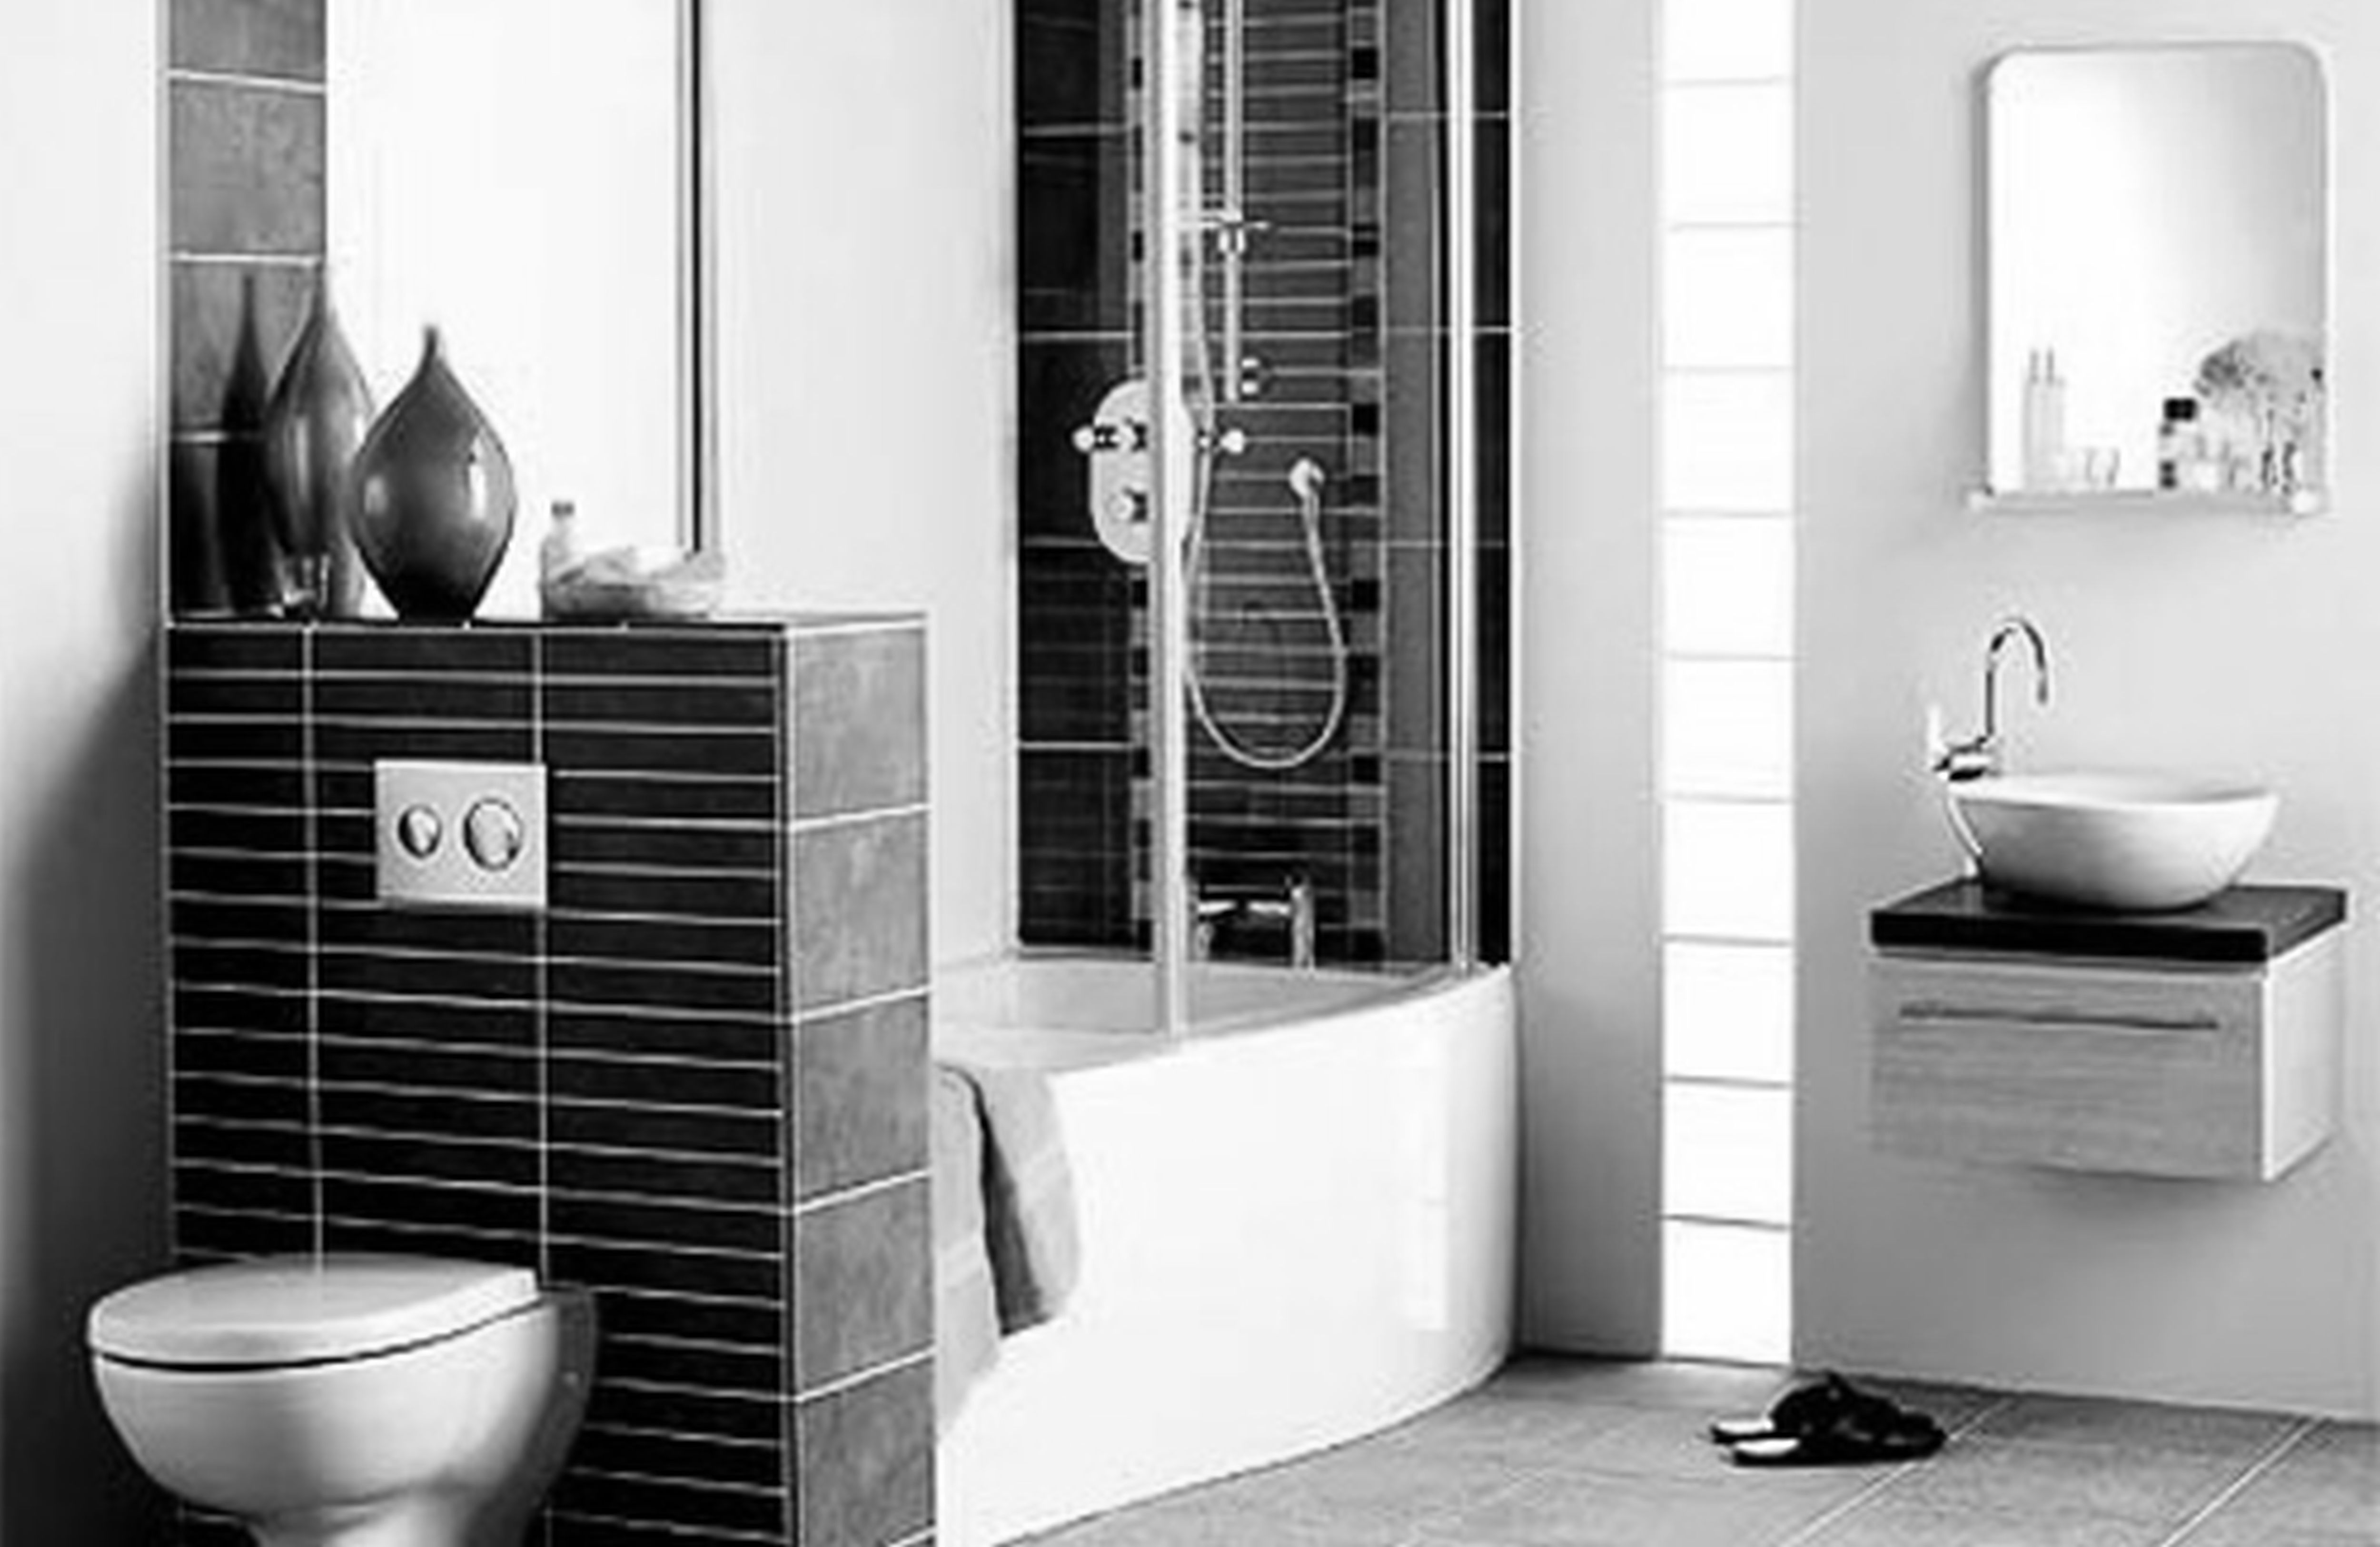 light grey bathroom ideas - Google Search | House ideas | Pinterest ...